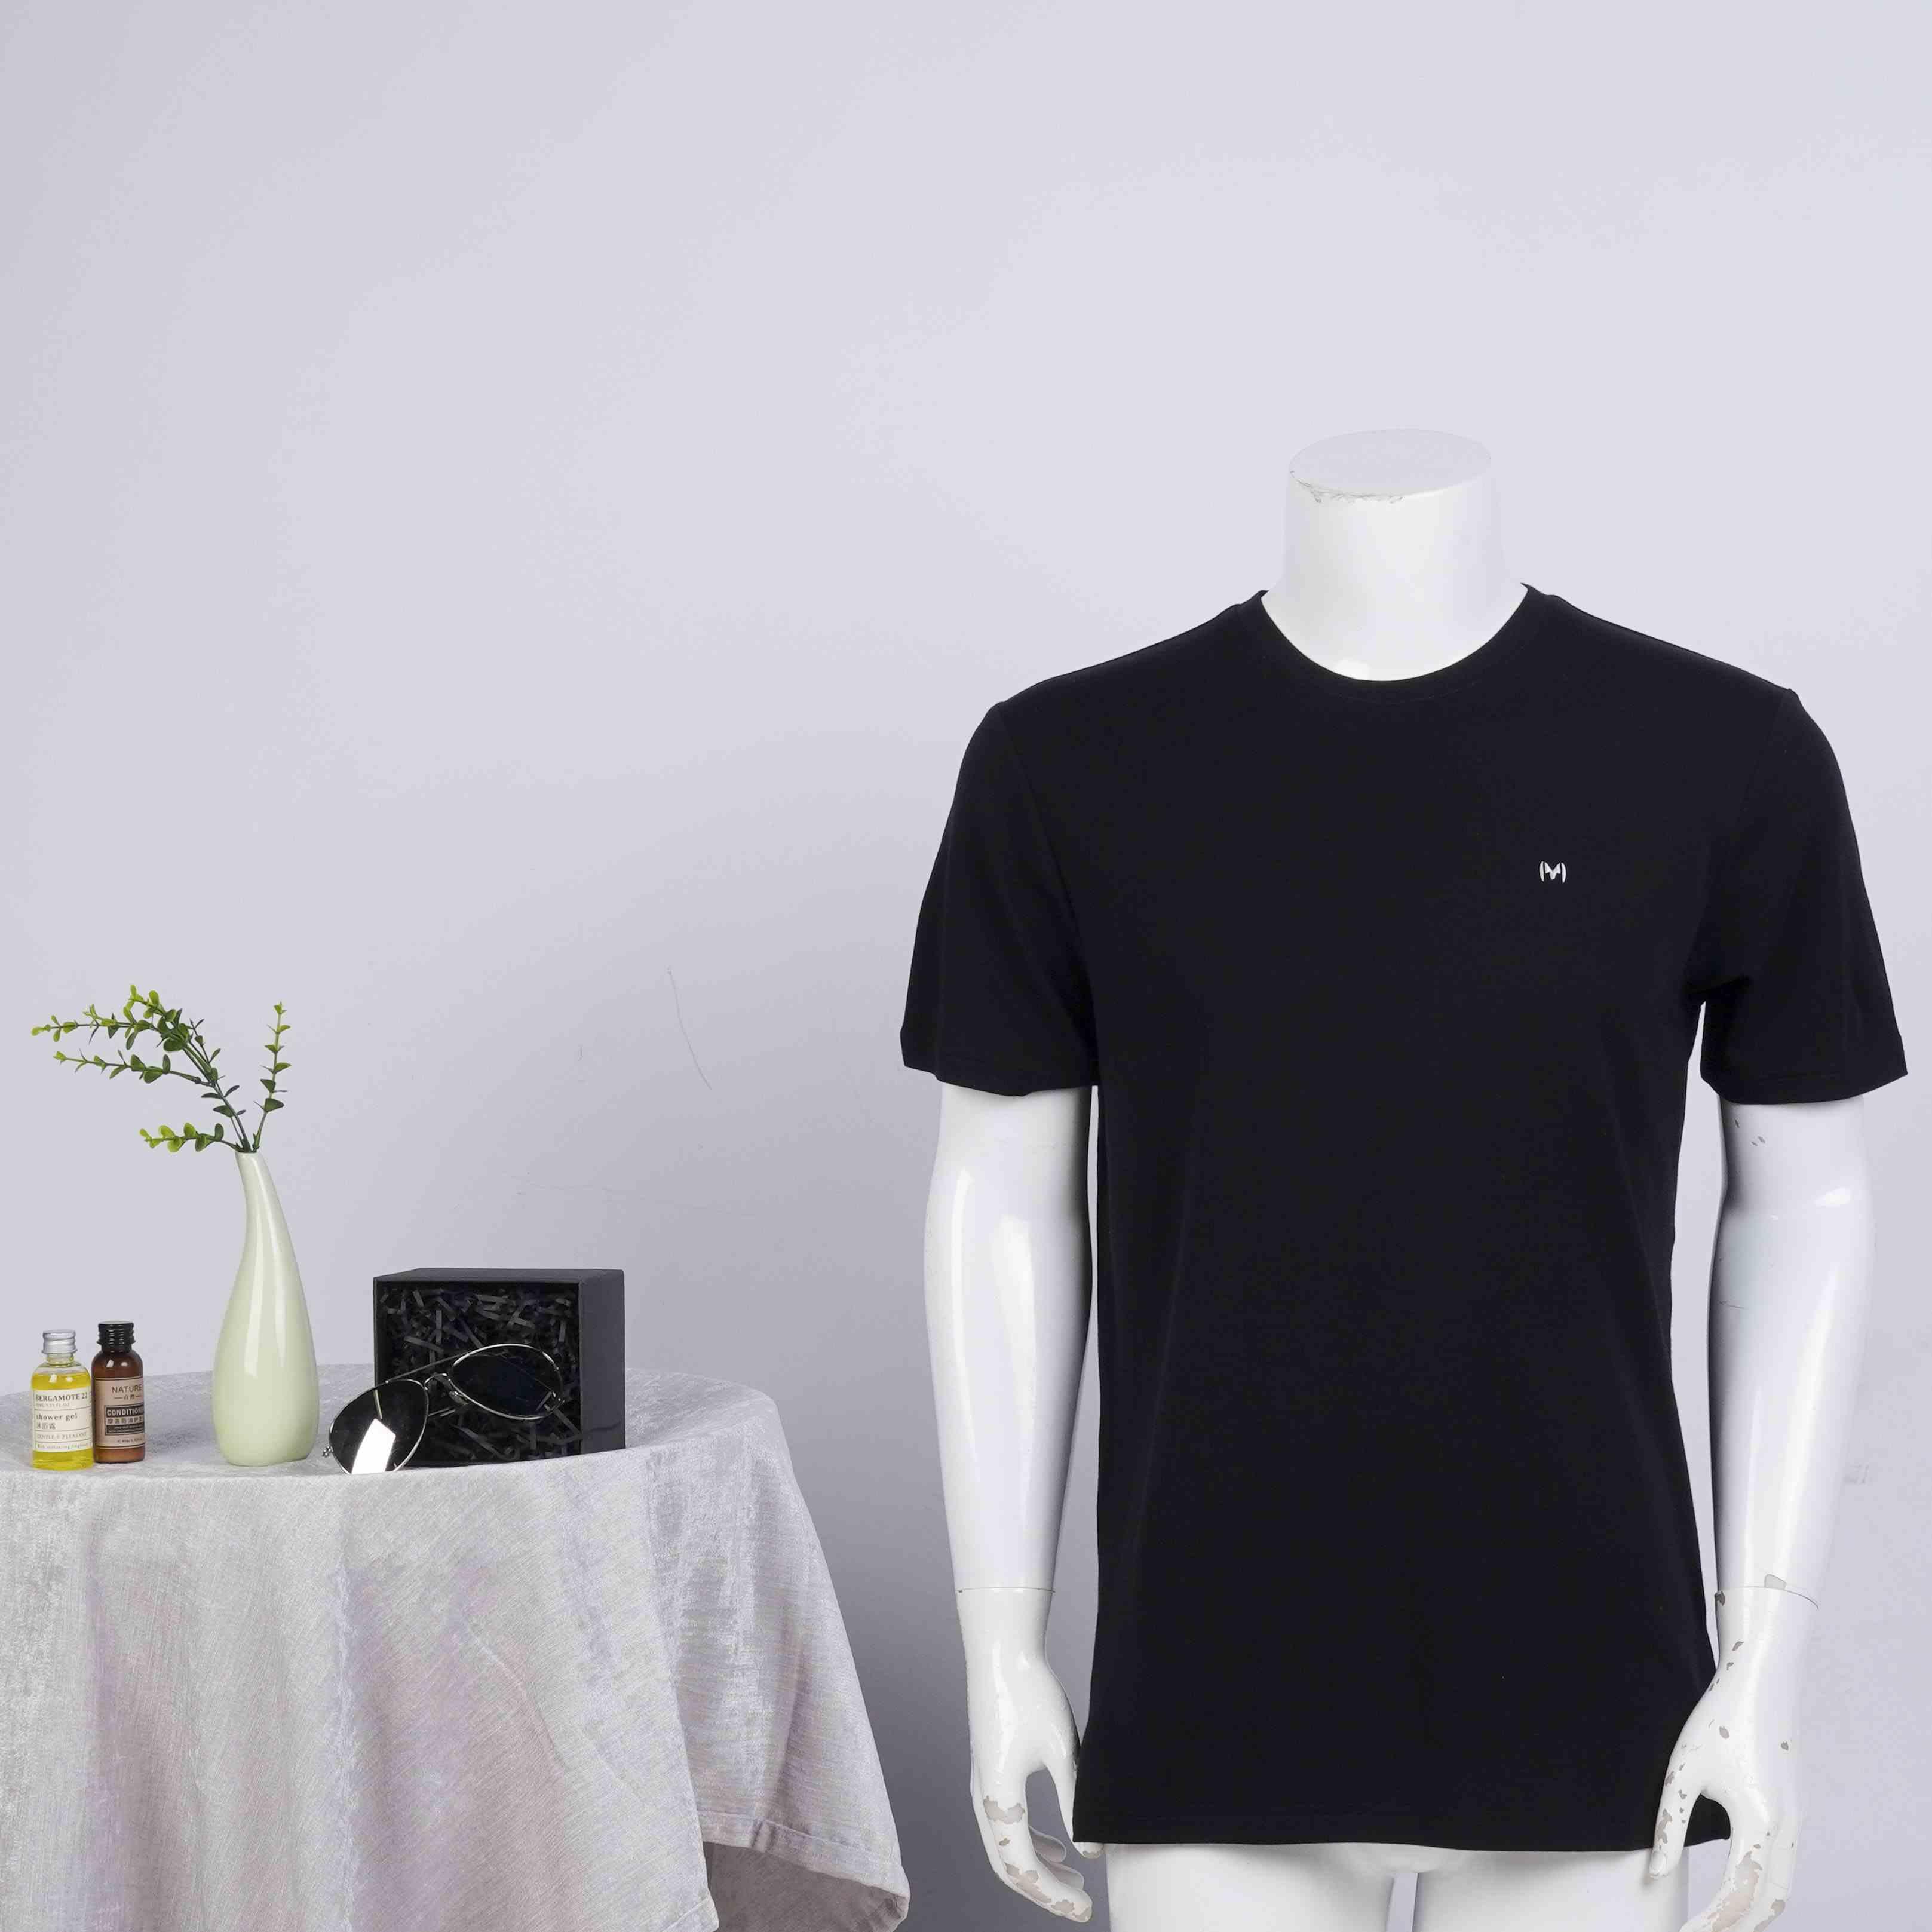 Maysheep / maysheep summer short sleeve t-shirt mens summer round neck bottom shirt solid color half sleeve top fashion